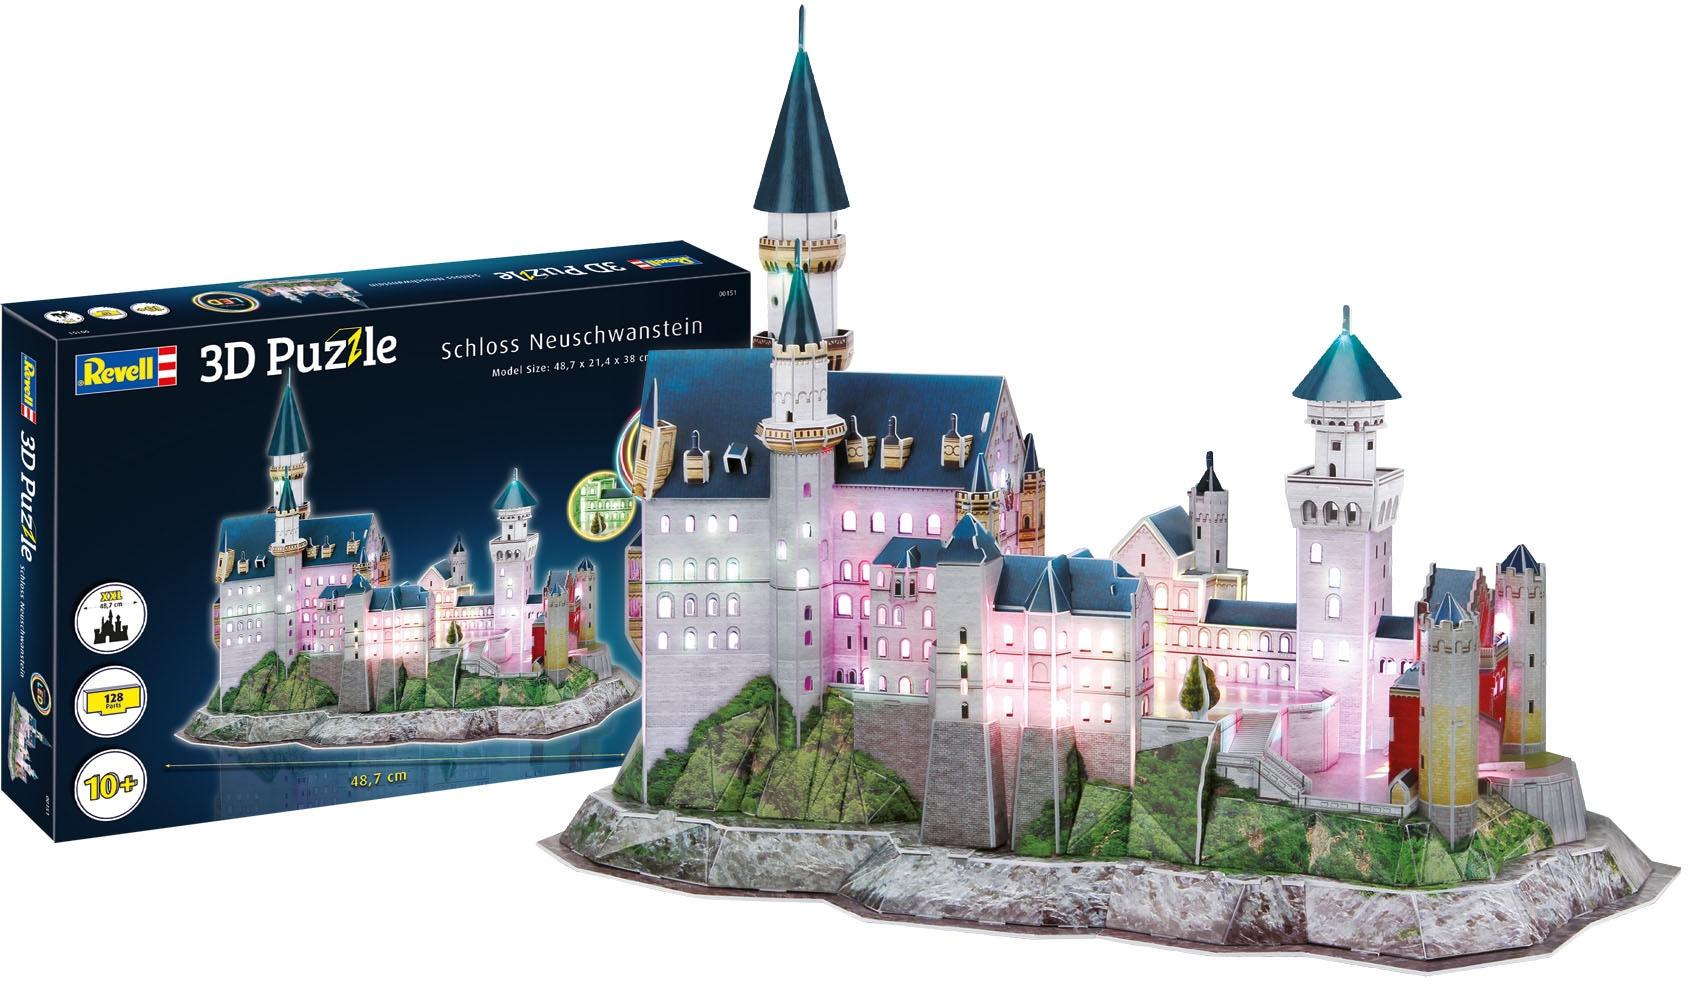 Revell 3D-Puzzle Schloss Neuschwanstein, LED-Edition weiß Kinder 3D Puzzle Gesellschaftsspiele